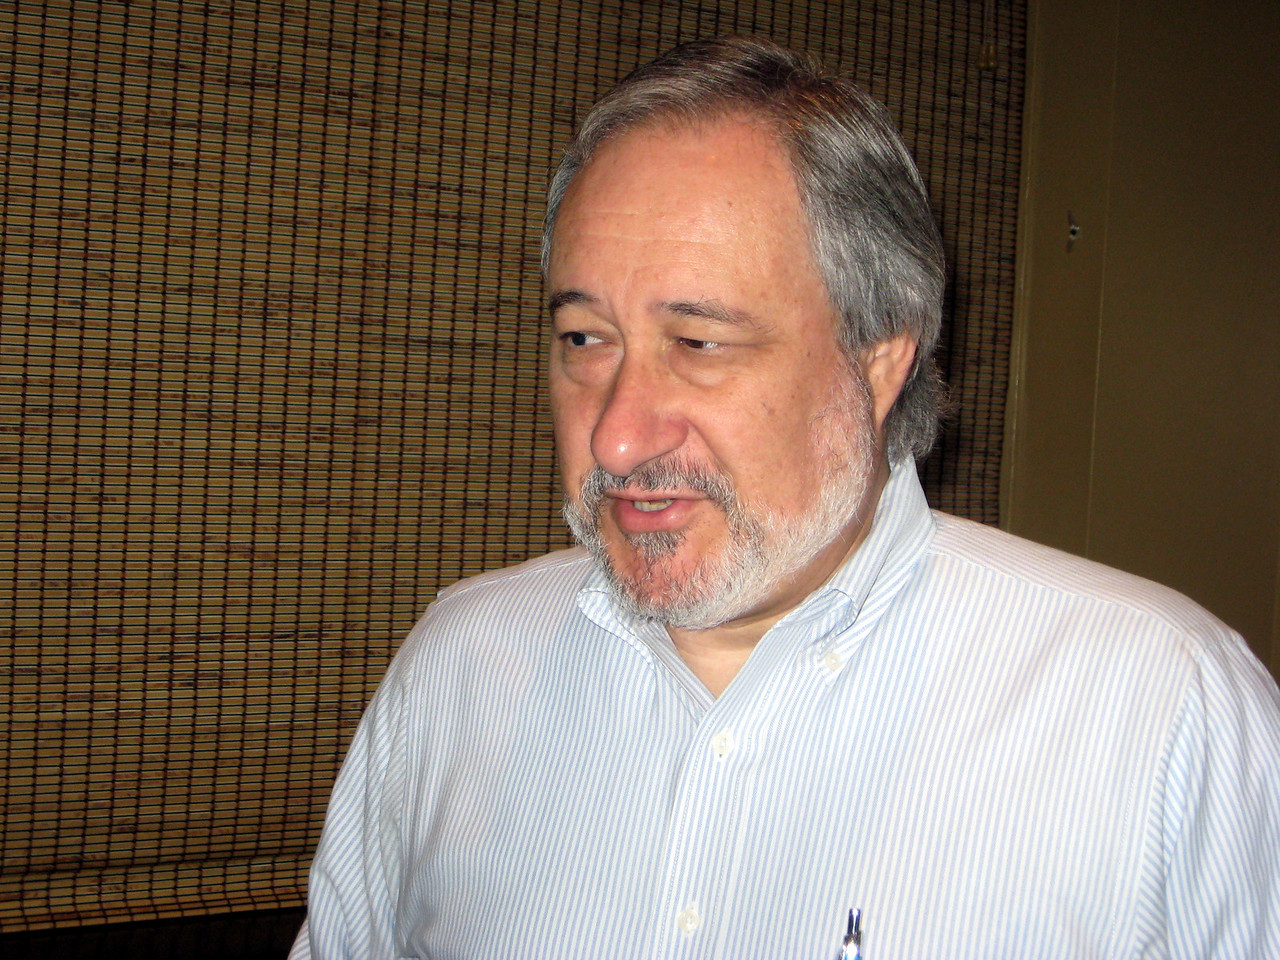 Club Secretary, Mike Winstead